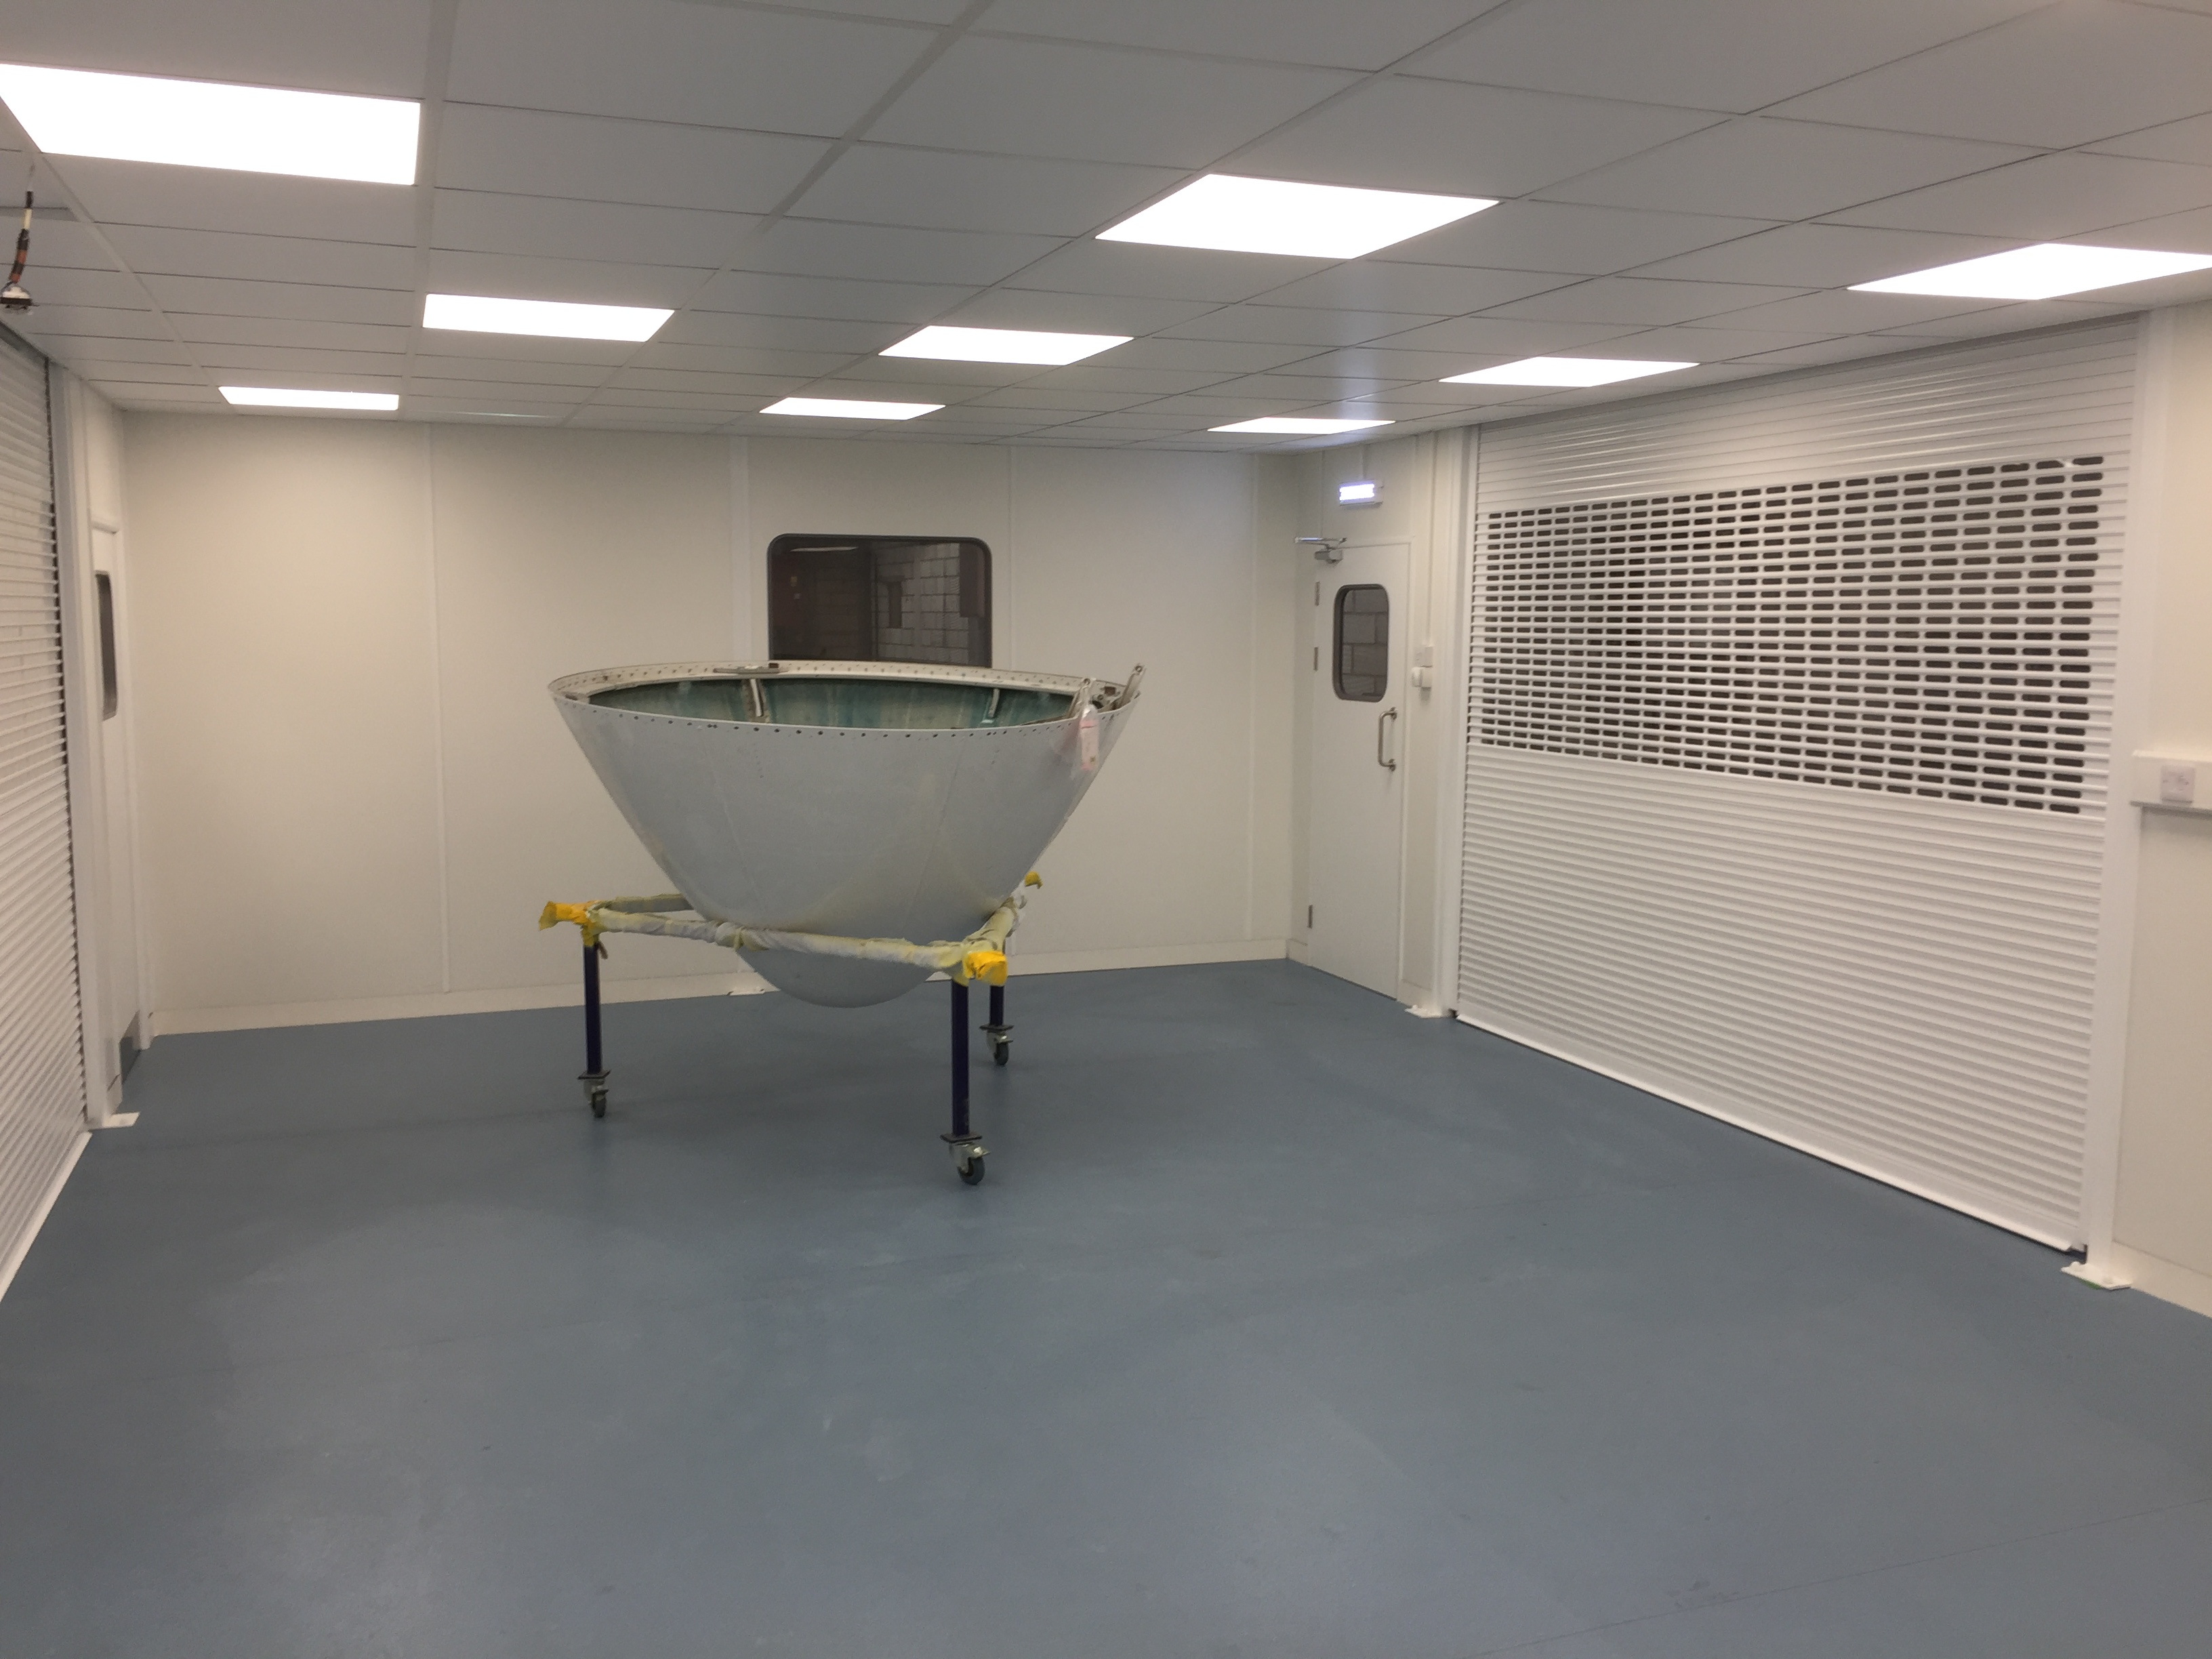 ceilings suspended vibratec engelska